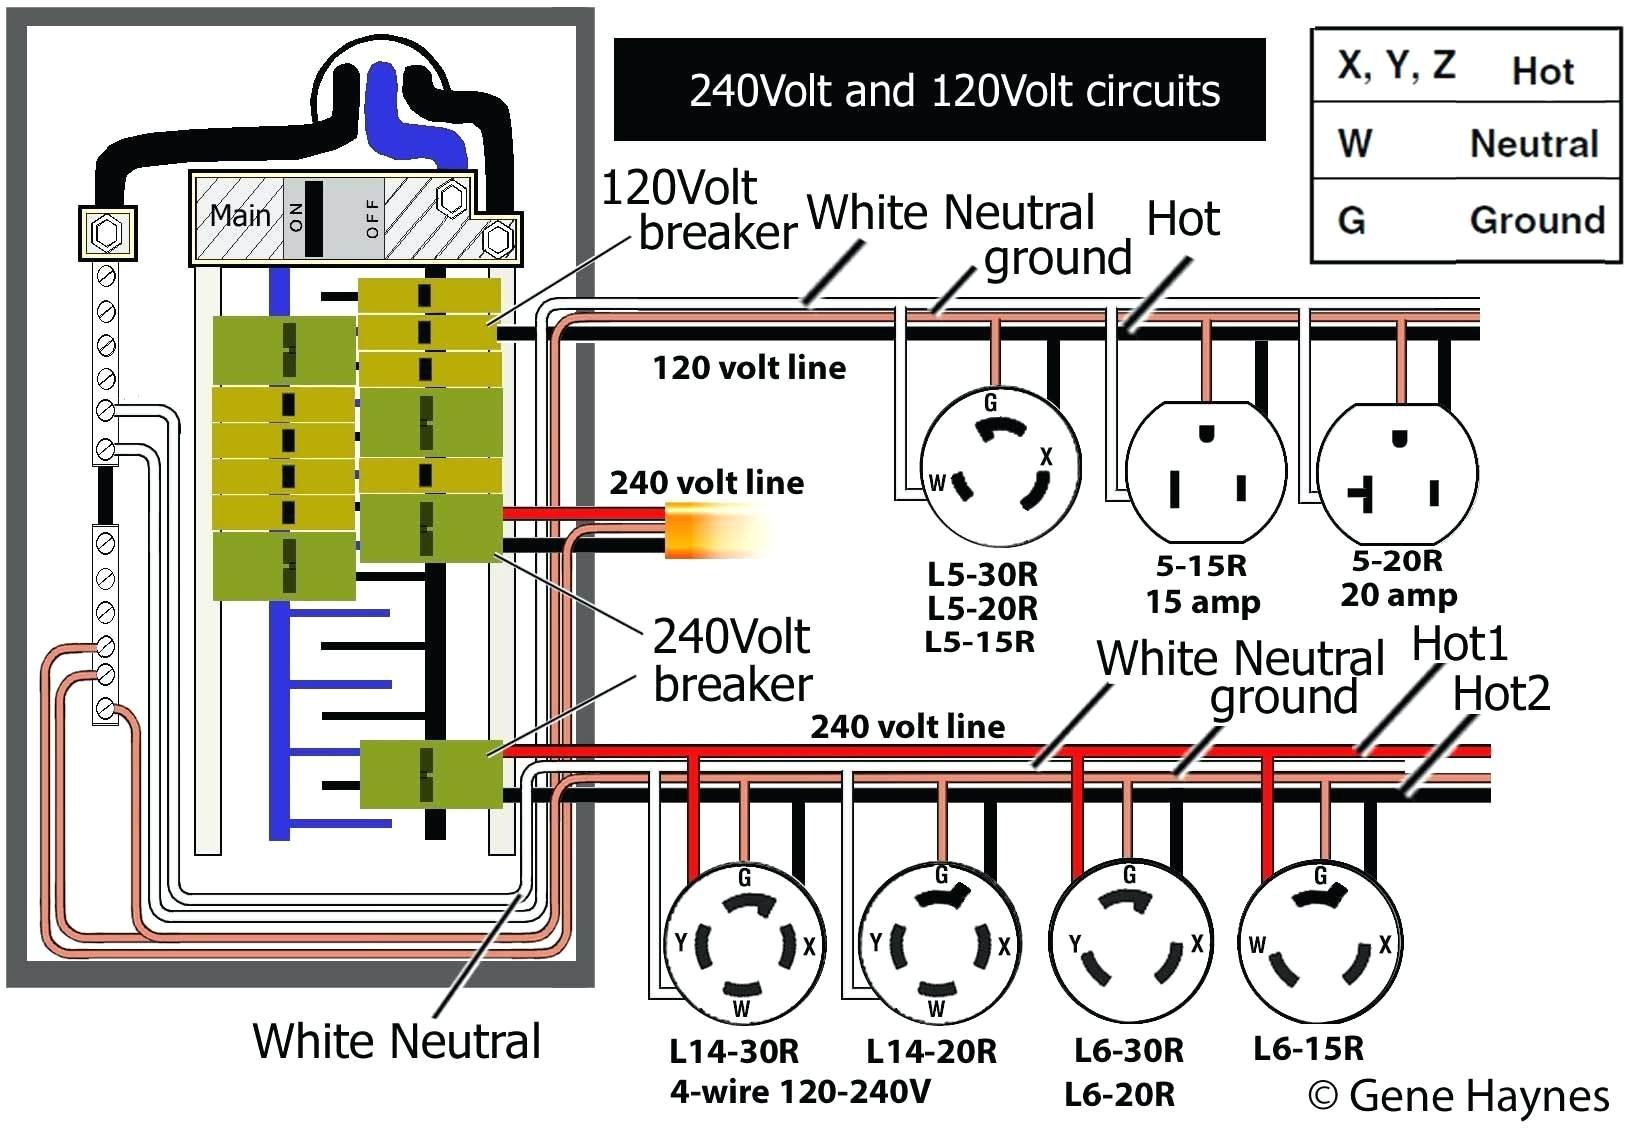 wiring a nema 5 20 plug wiring diagram blog nema 5 20r wiring diagram nema 5 20r diagram